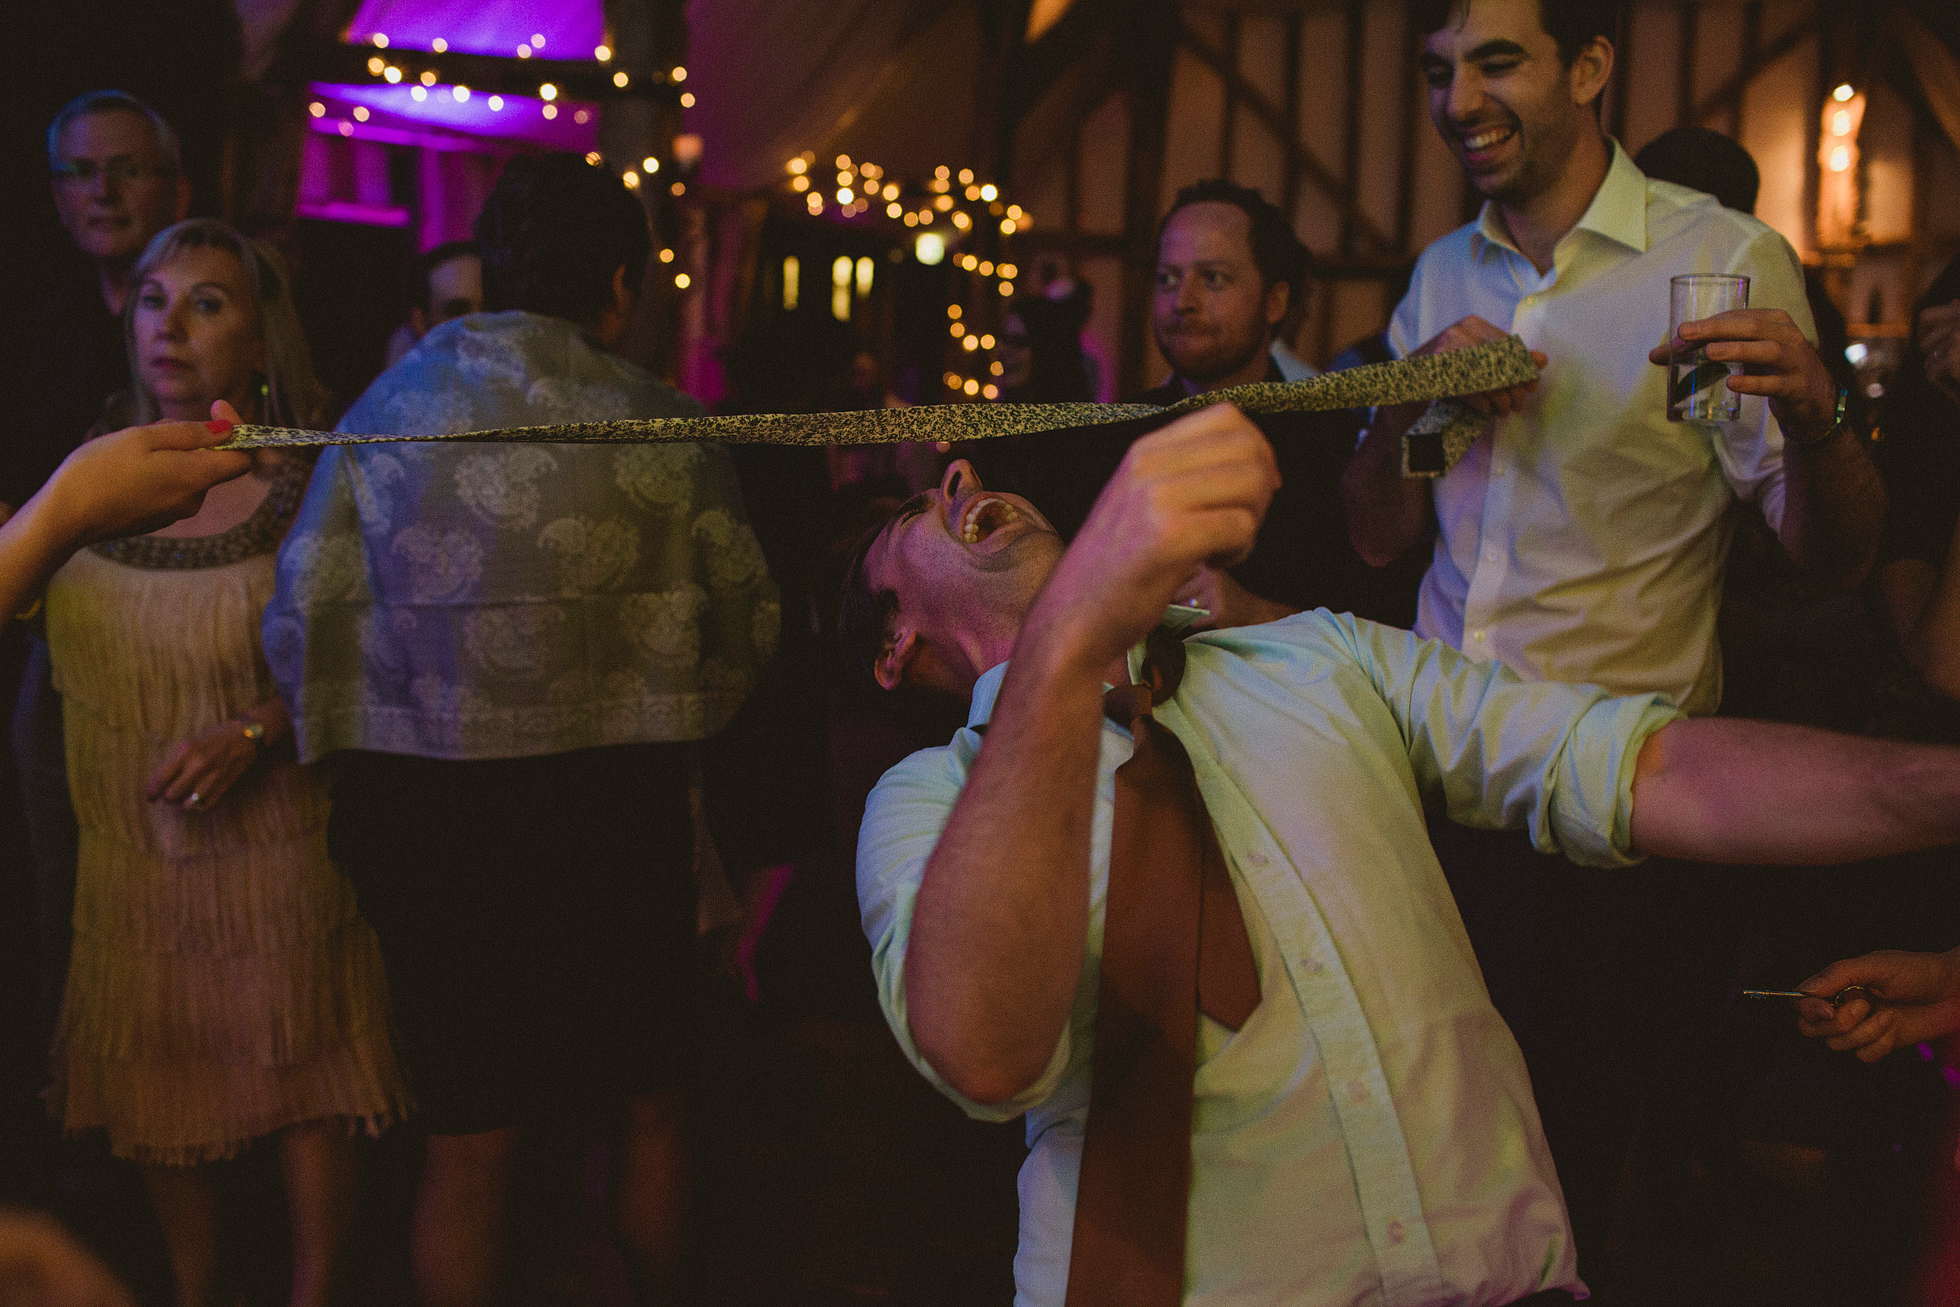 South Farm wedding dance images